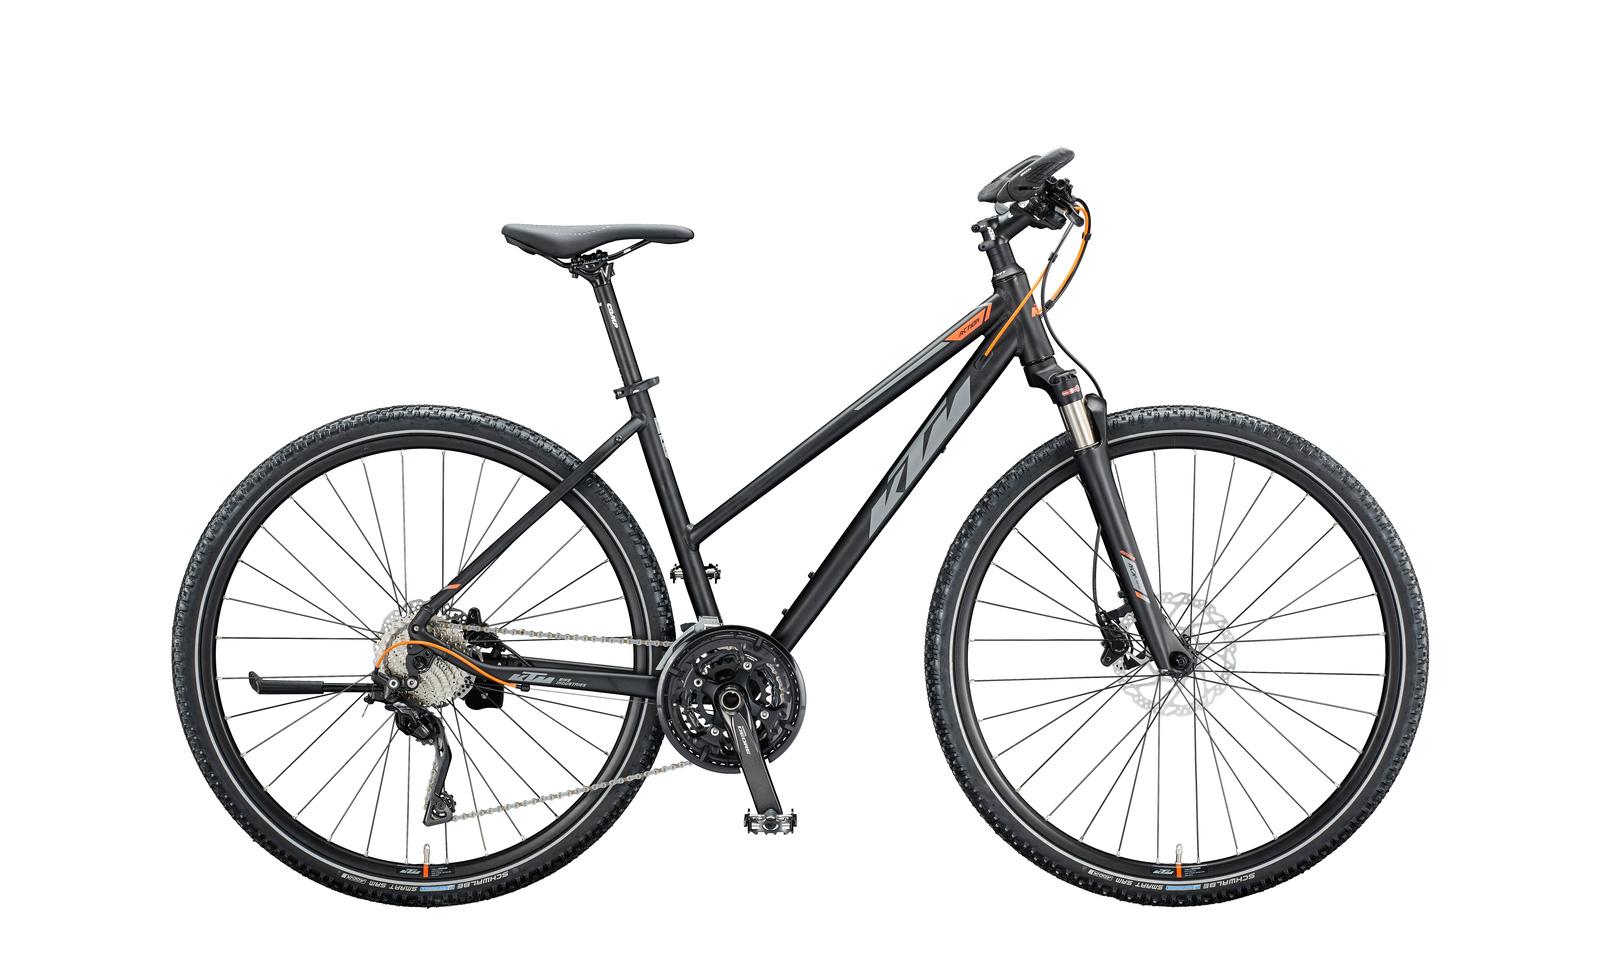 Biciclete KTM Trekking Offroad LIFE ACTION 3x10 Shimano Deore XT/Deore